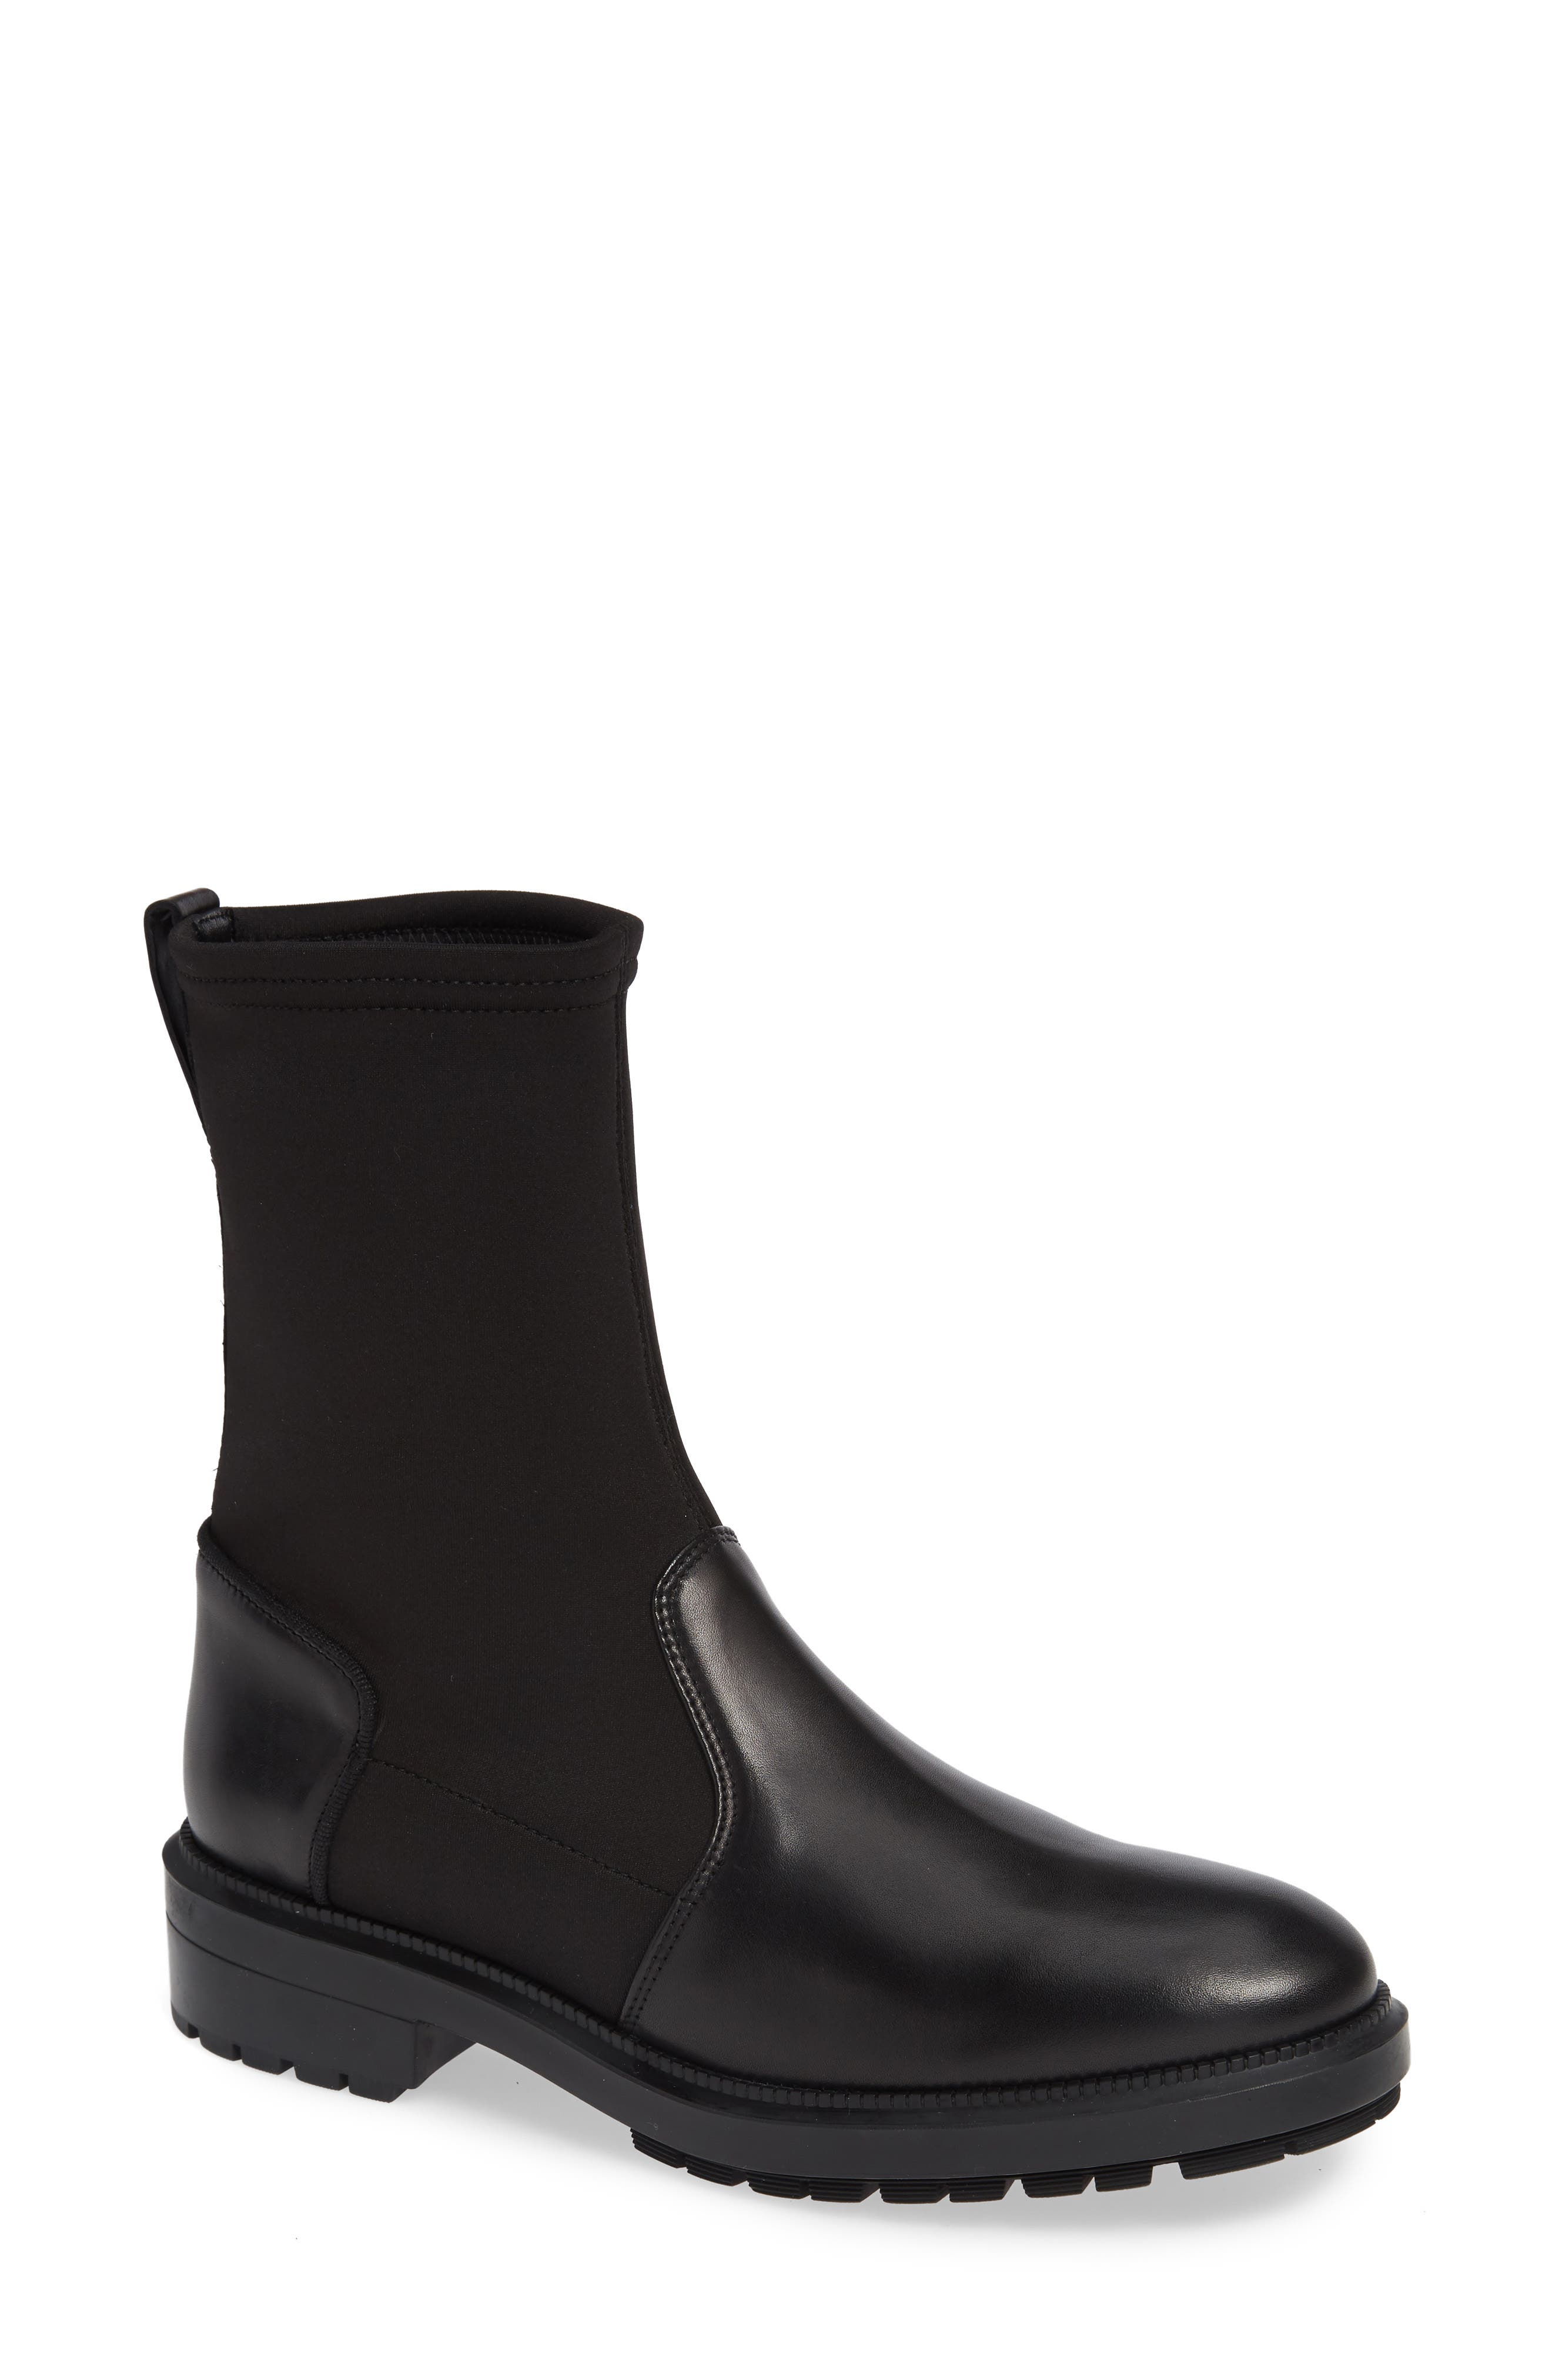 Leoda Ankle Boot,                         Main,                         color, BLACK